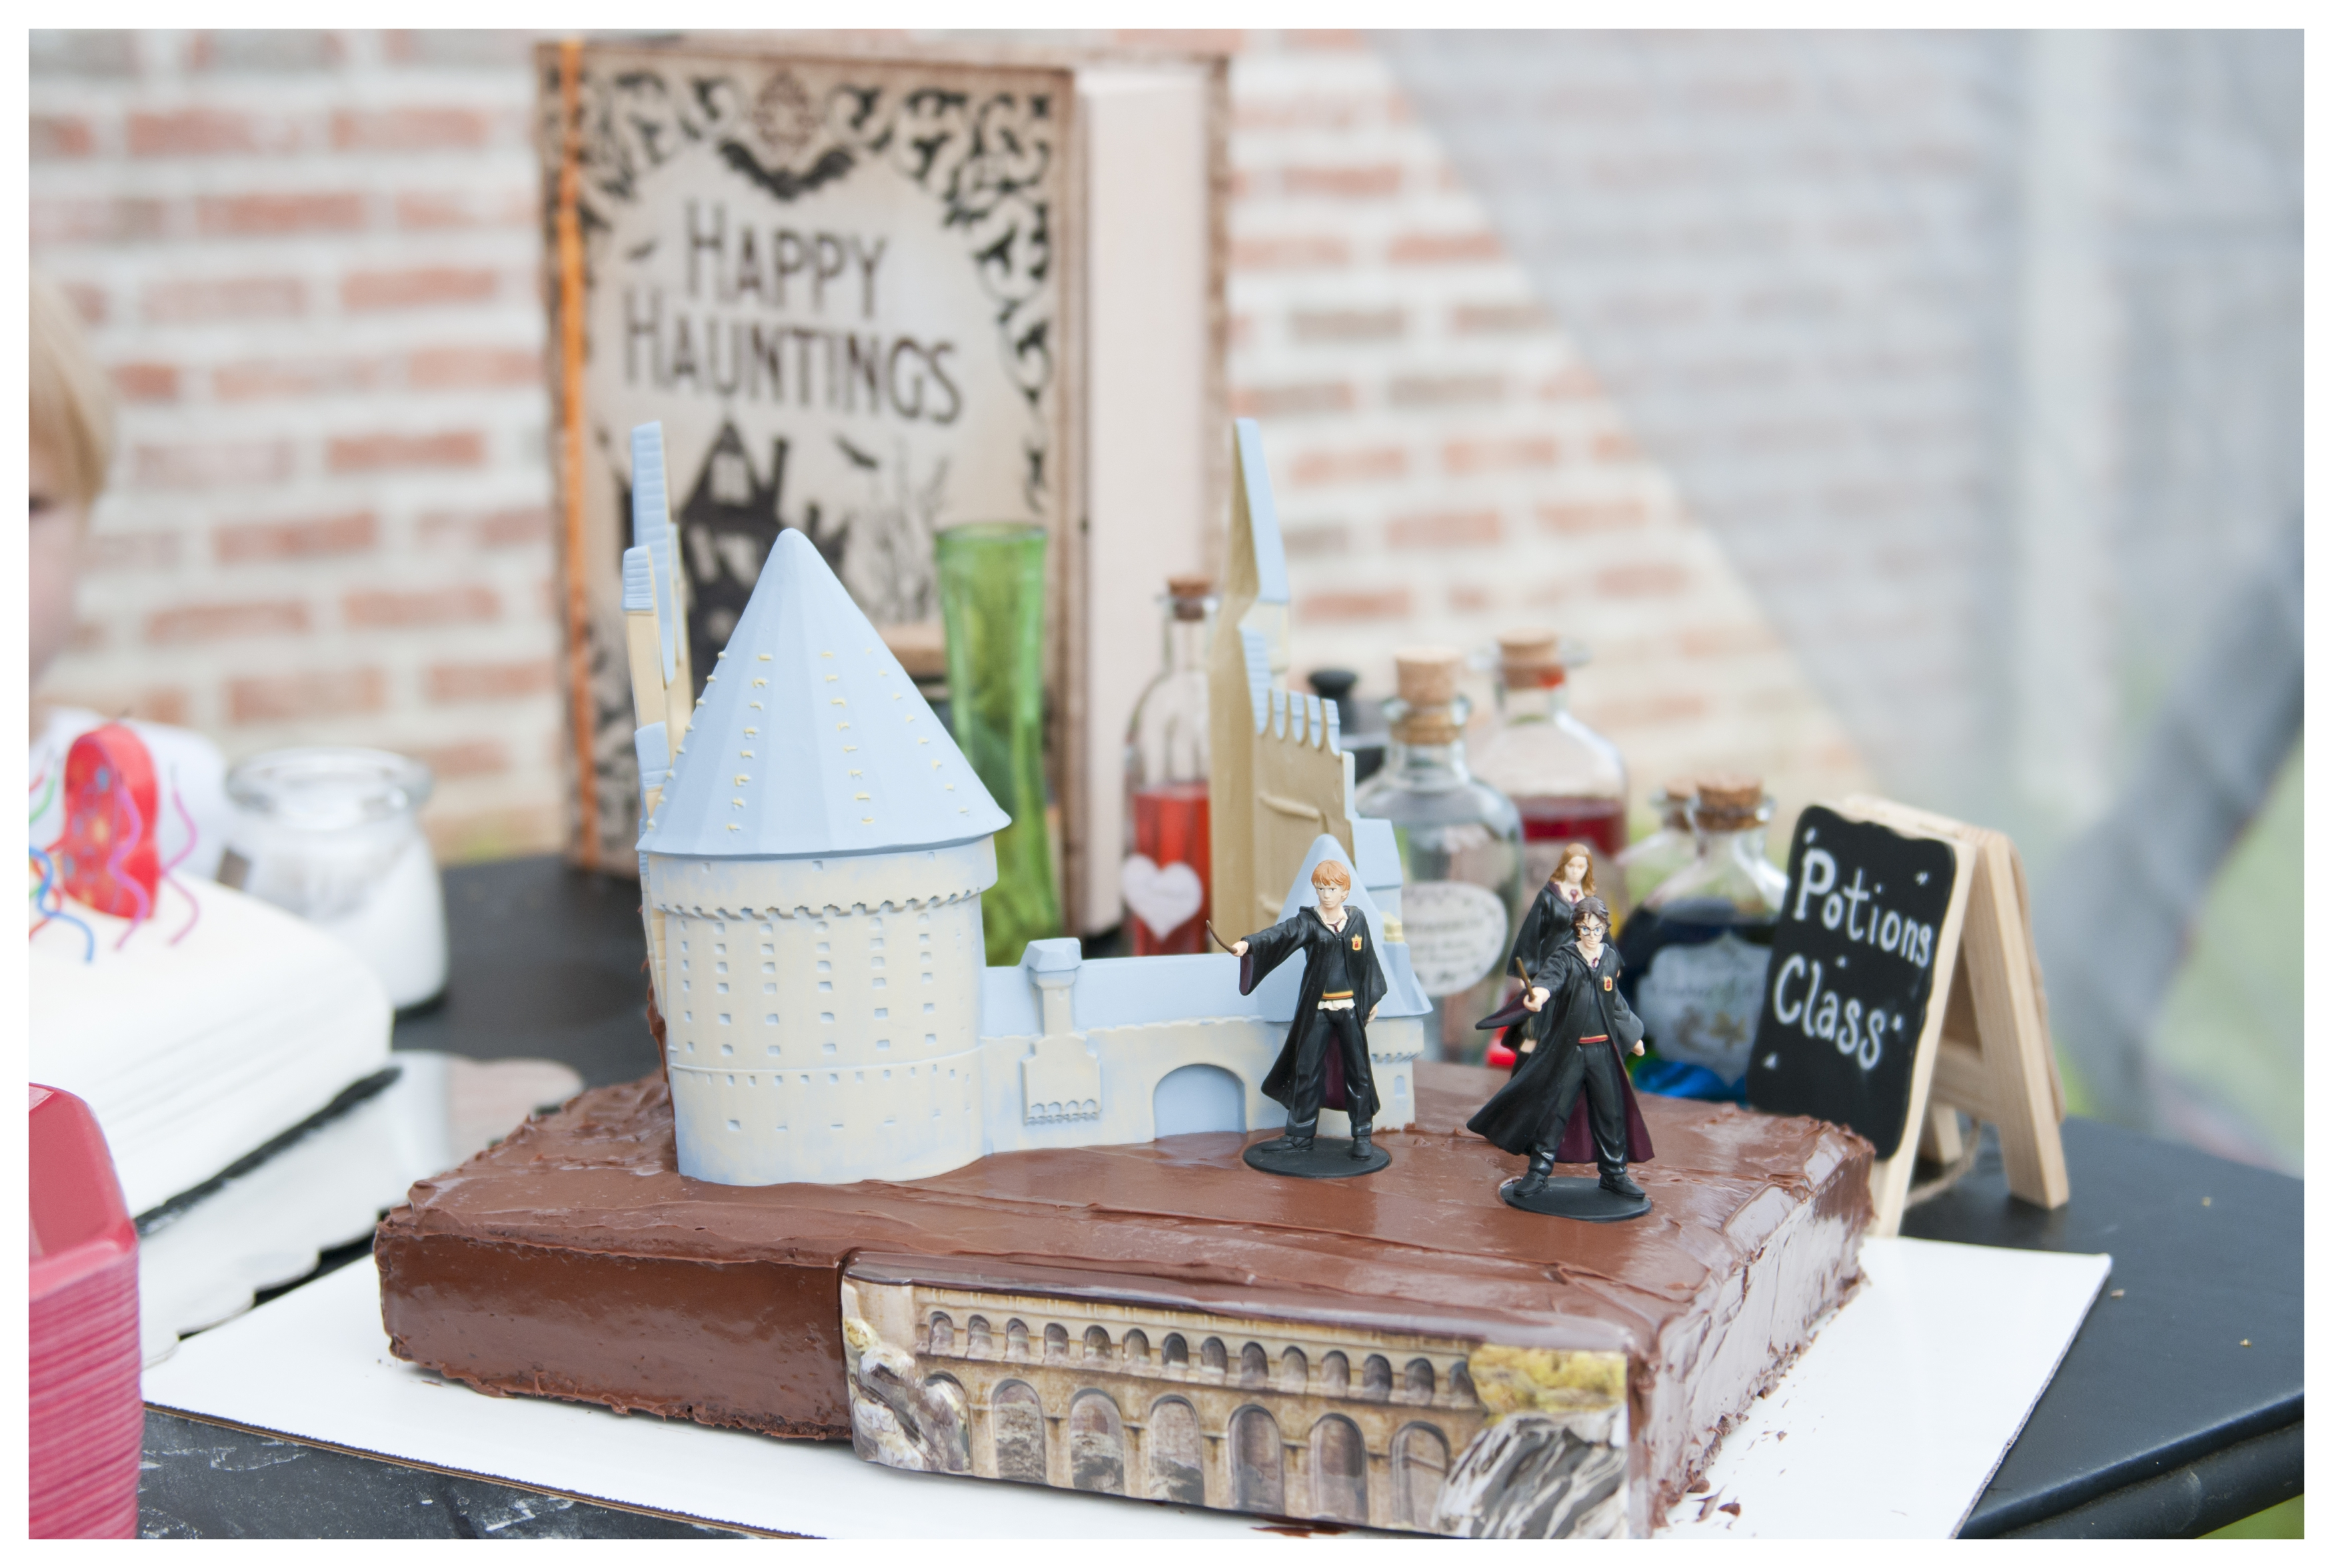 Longview-Harry Potter-Birthday-Cake-Photo